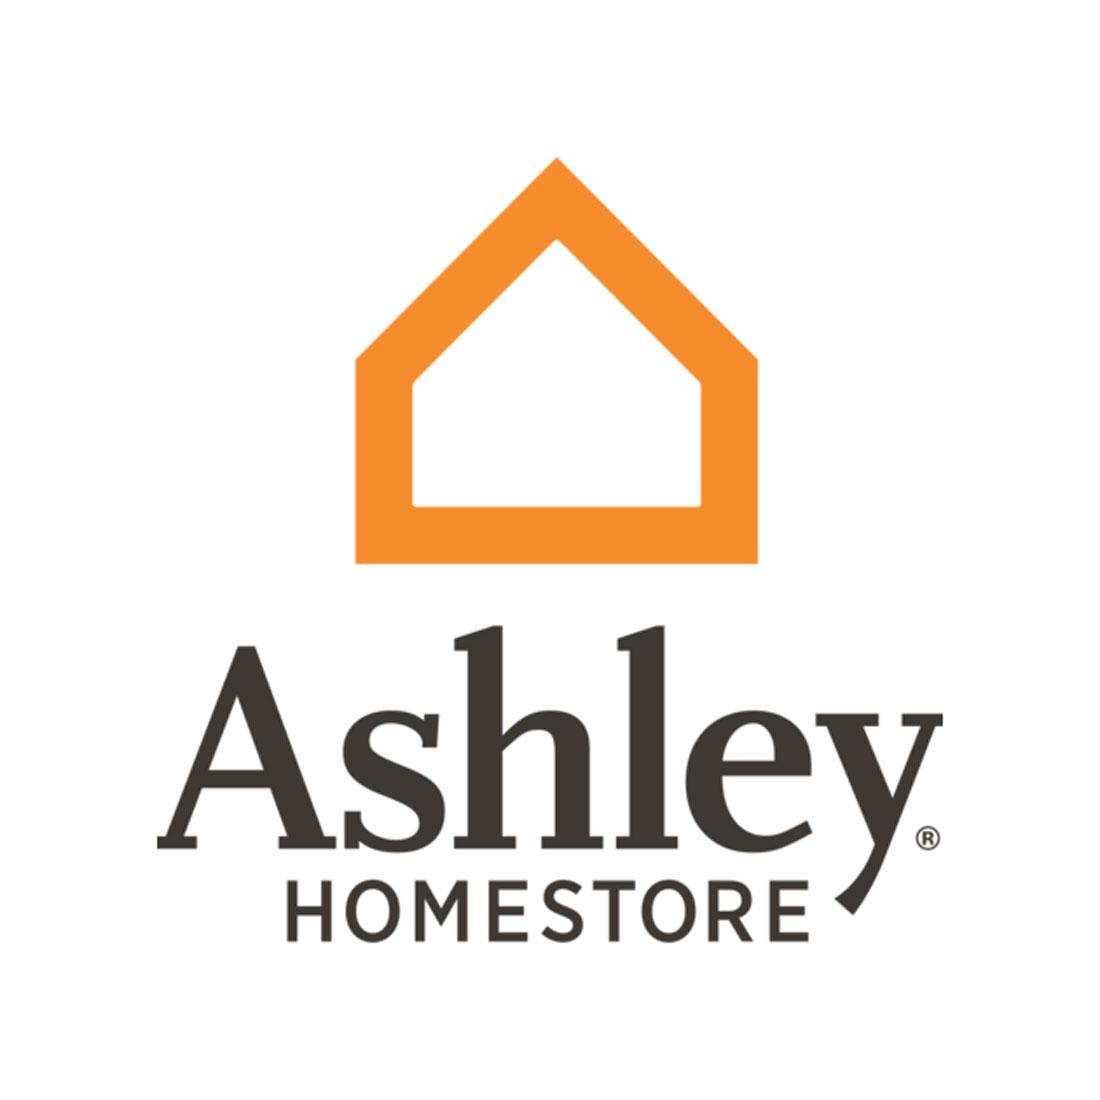 Glenn DiVincent - Factory Direct Enterprises LLC. d/b/a Ashley HomeStore